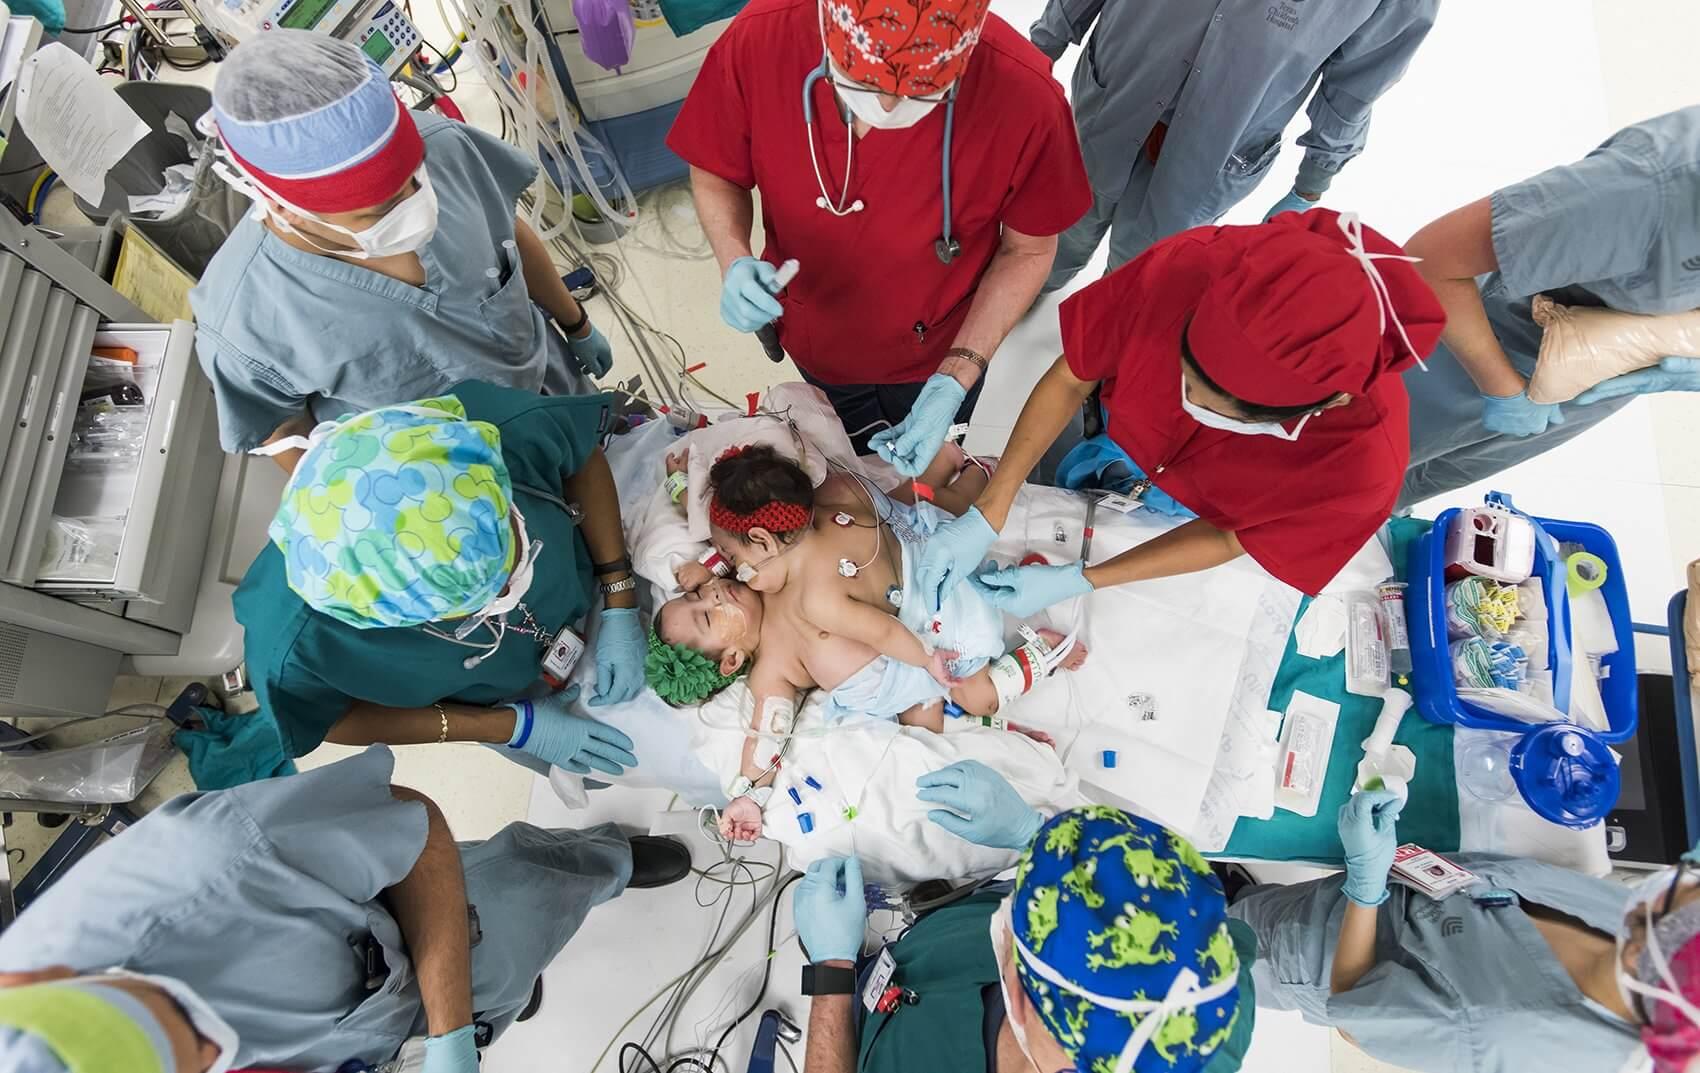 (Credit: Allen S. Kramer/Texas Children's Hospital)